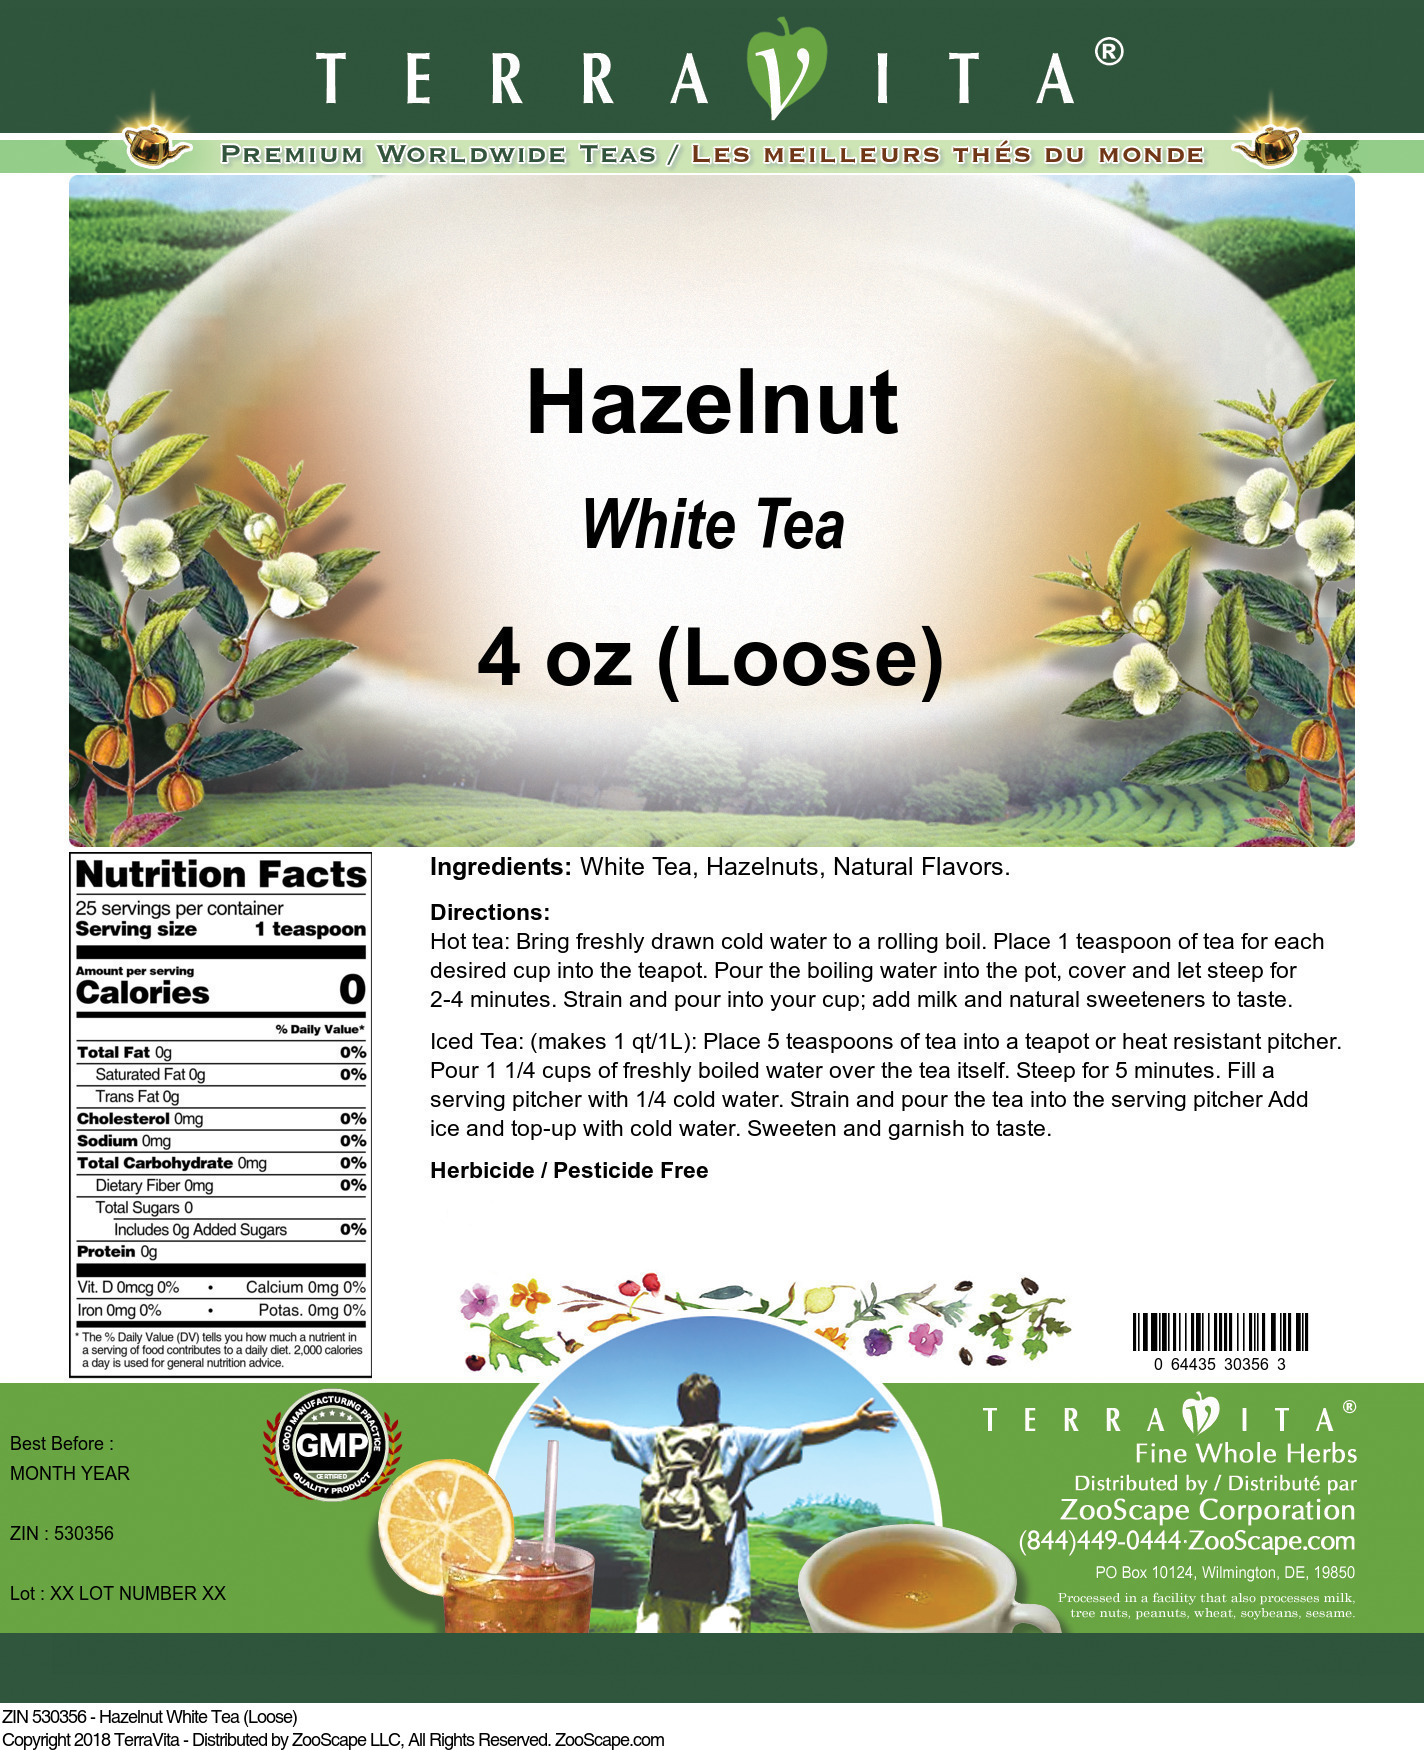 Hazelnut White Tea